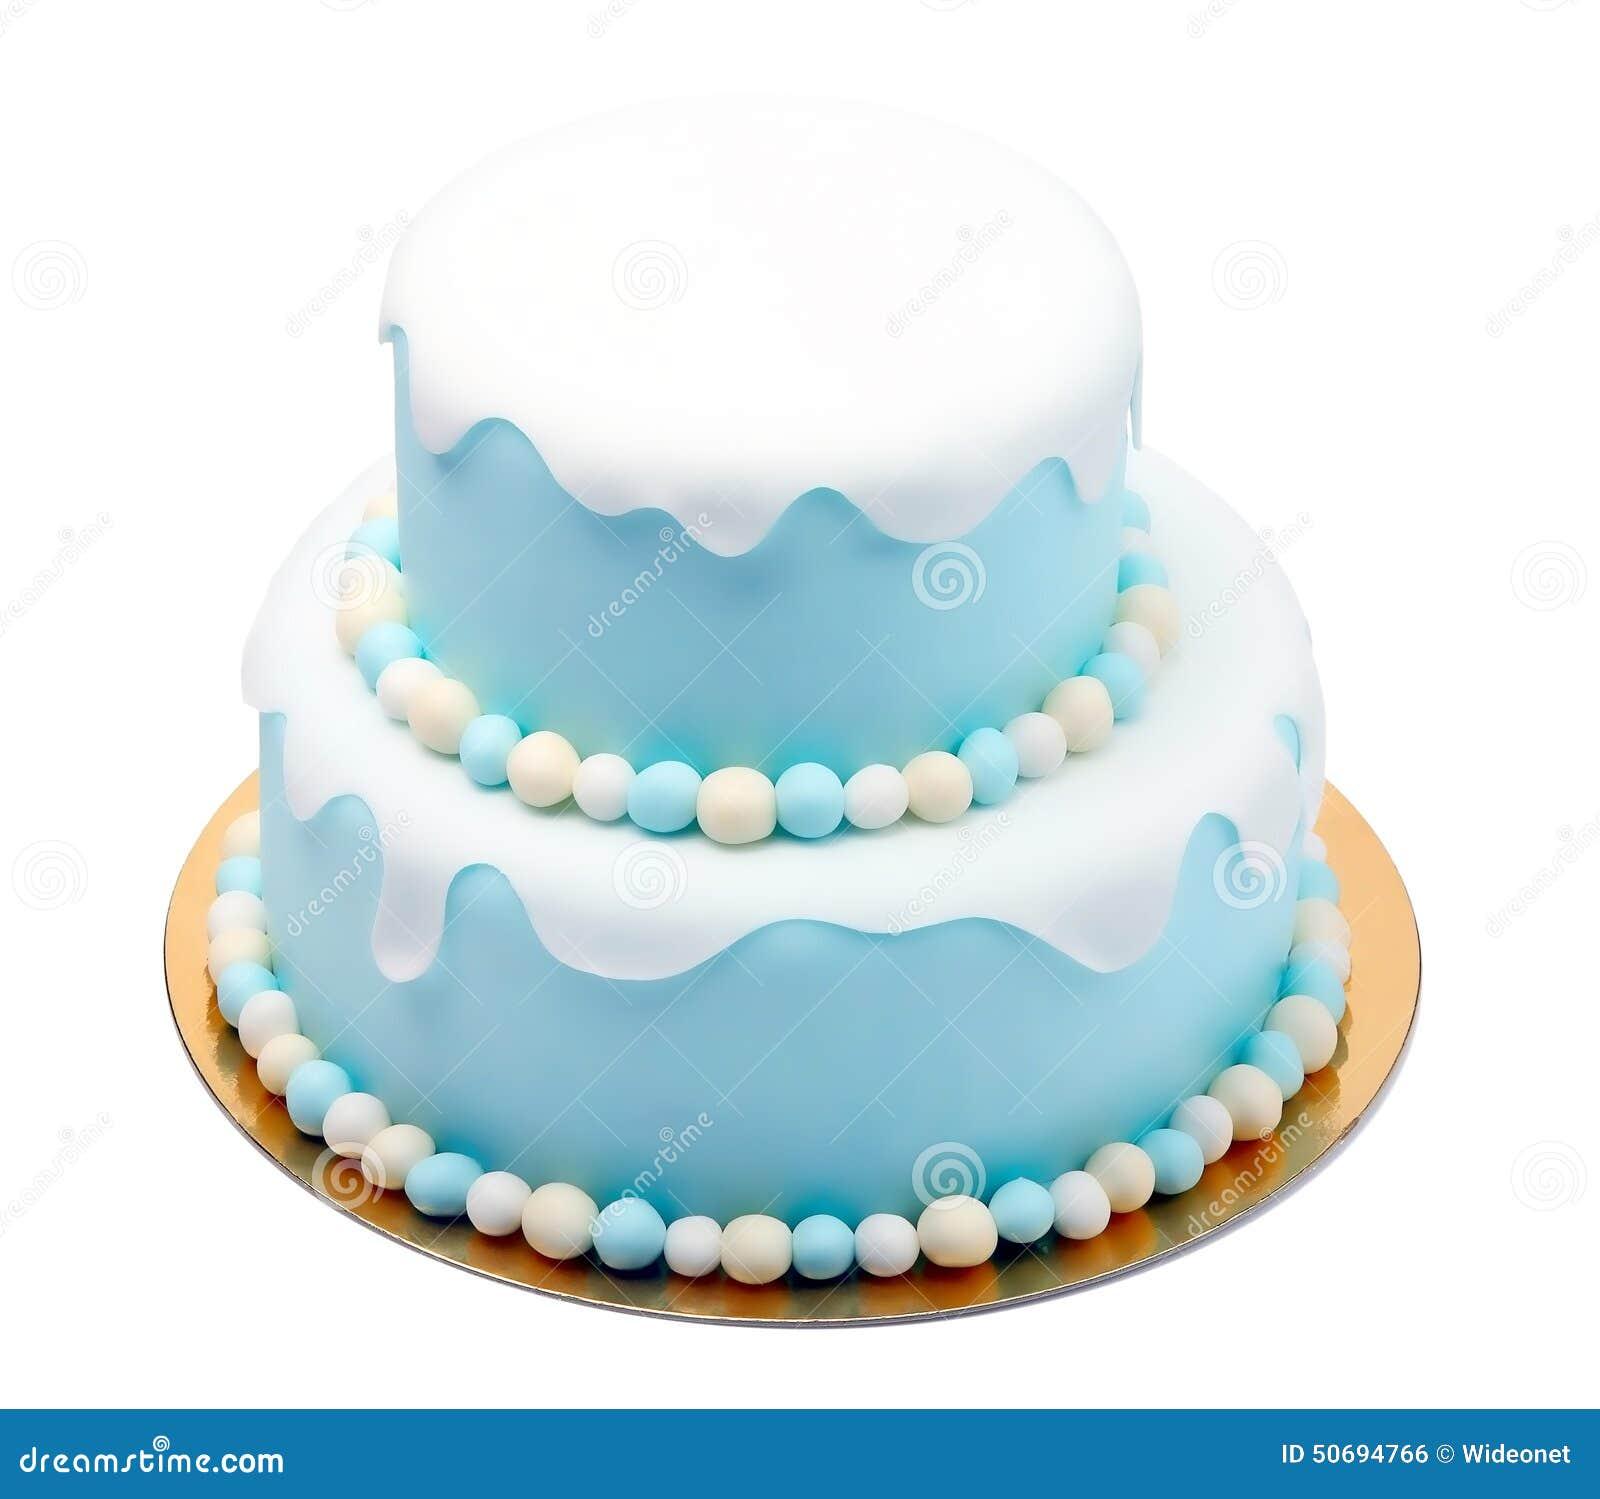 Birthday Blue Cake With Mini Balls Isolated On White Background Stock Photo